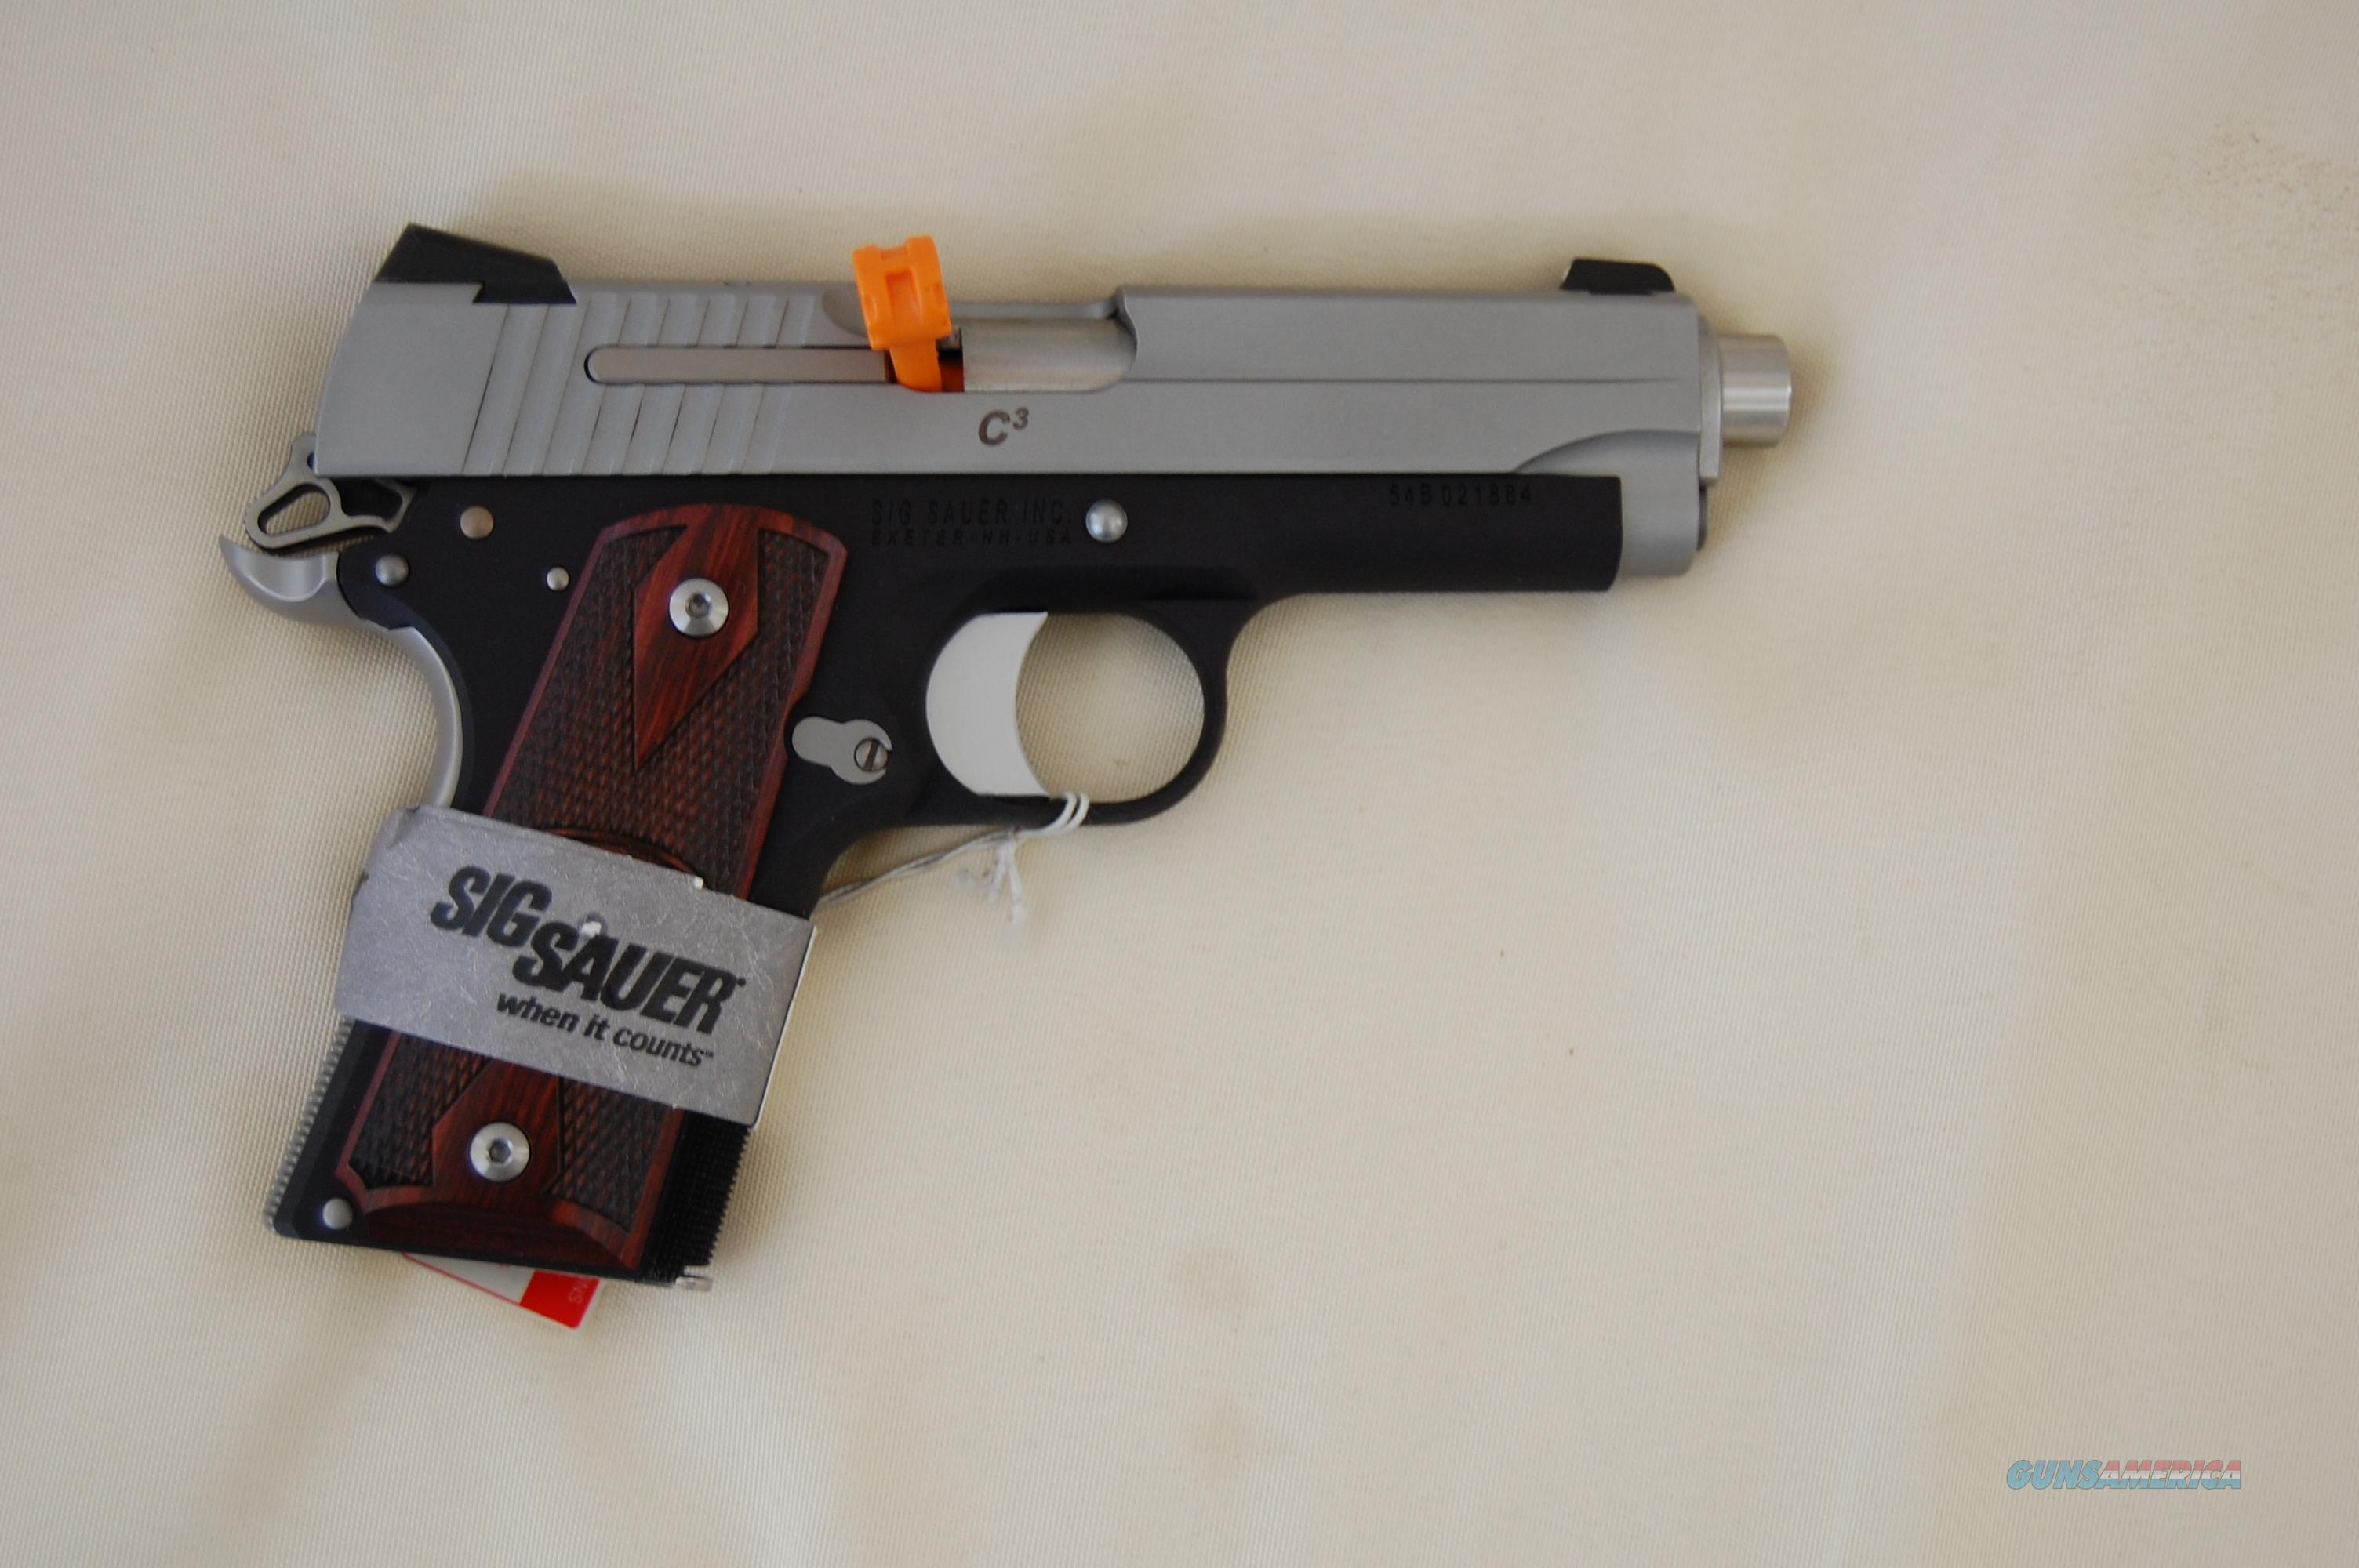 Sig Sauer  Guns > Pistols > Sig - Sauer/Sigarms Pistols > 1911